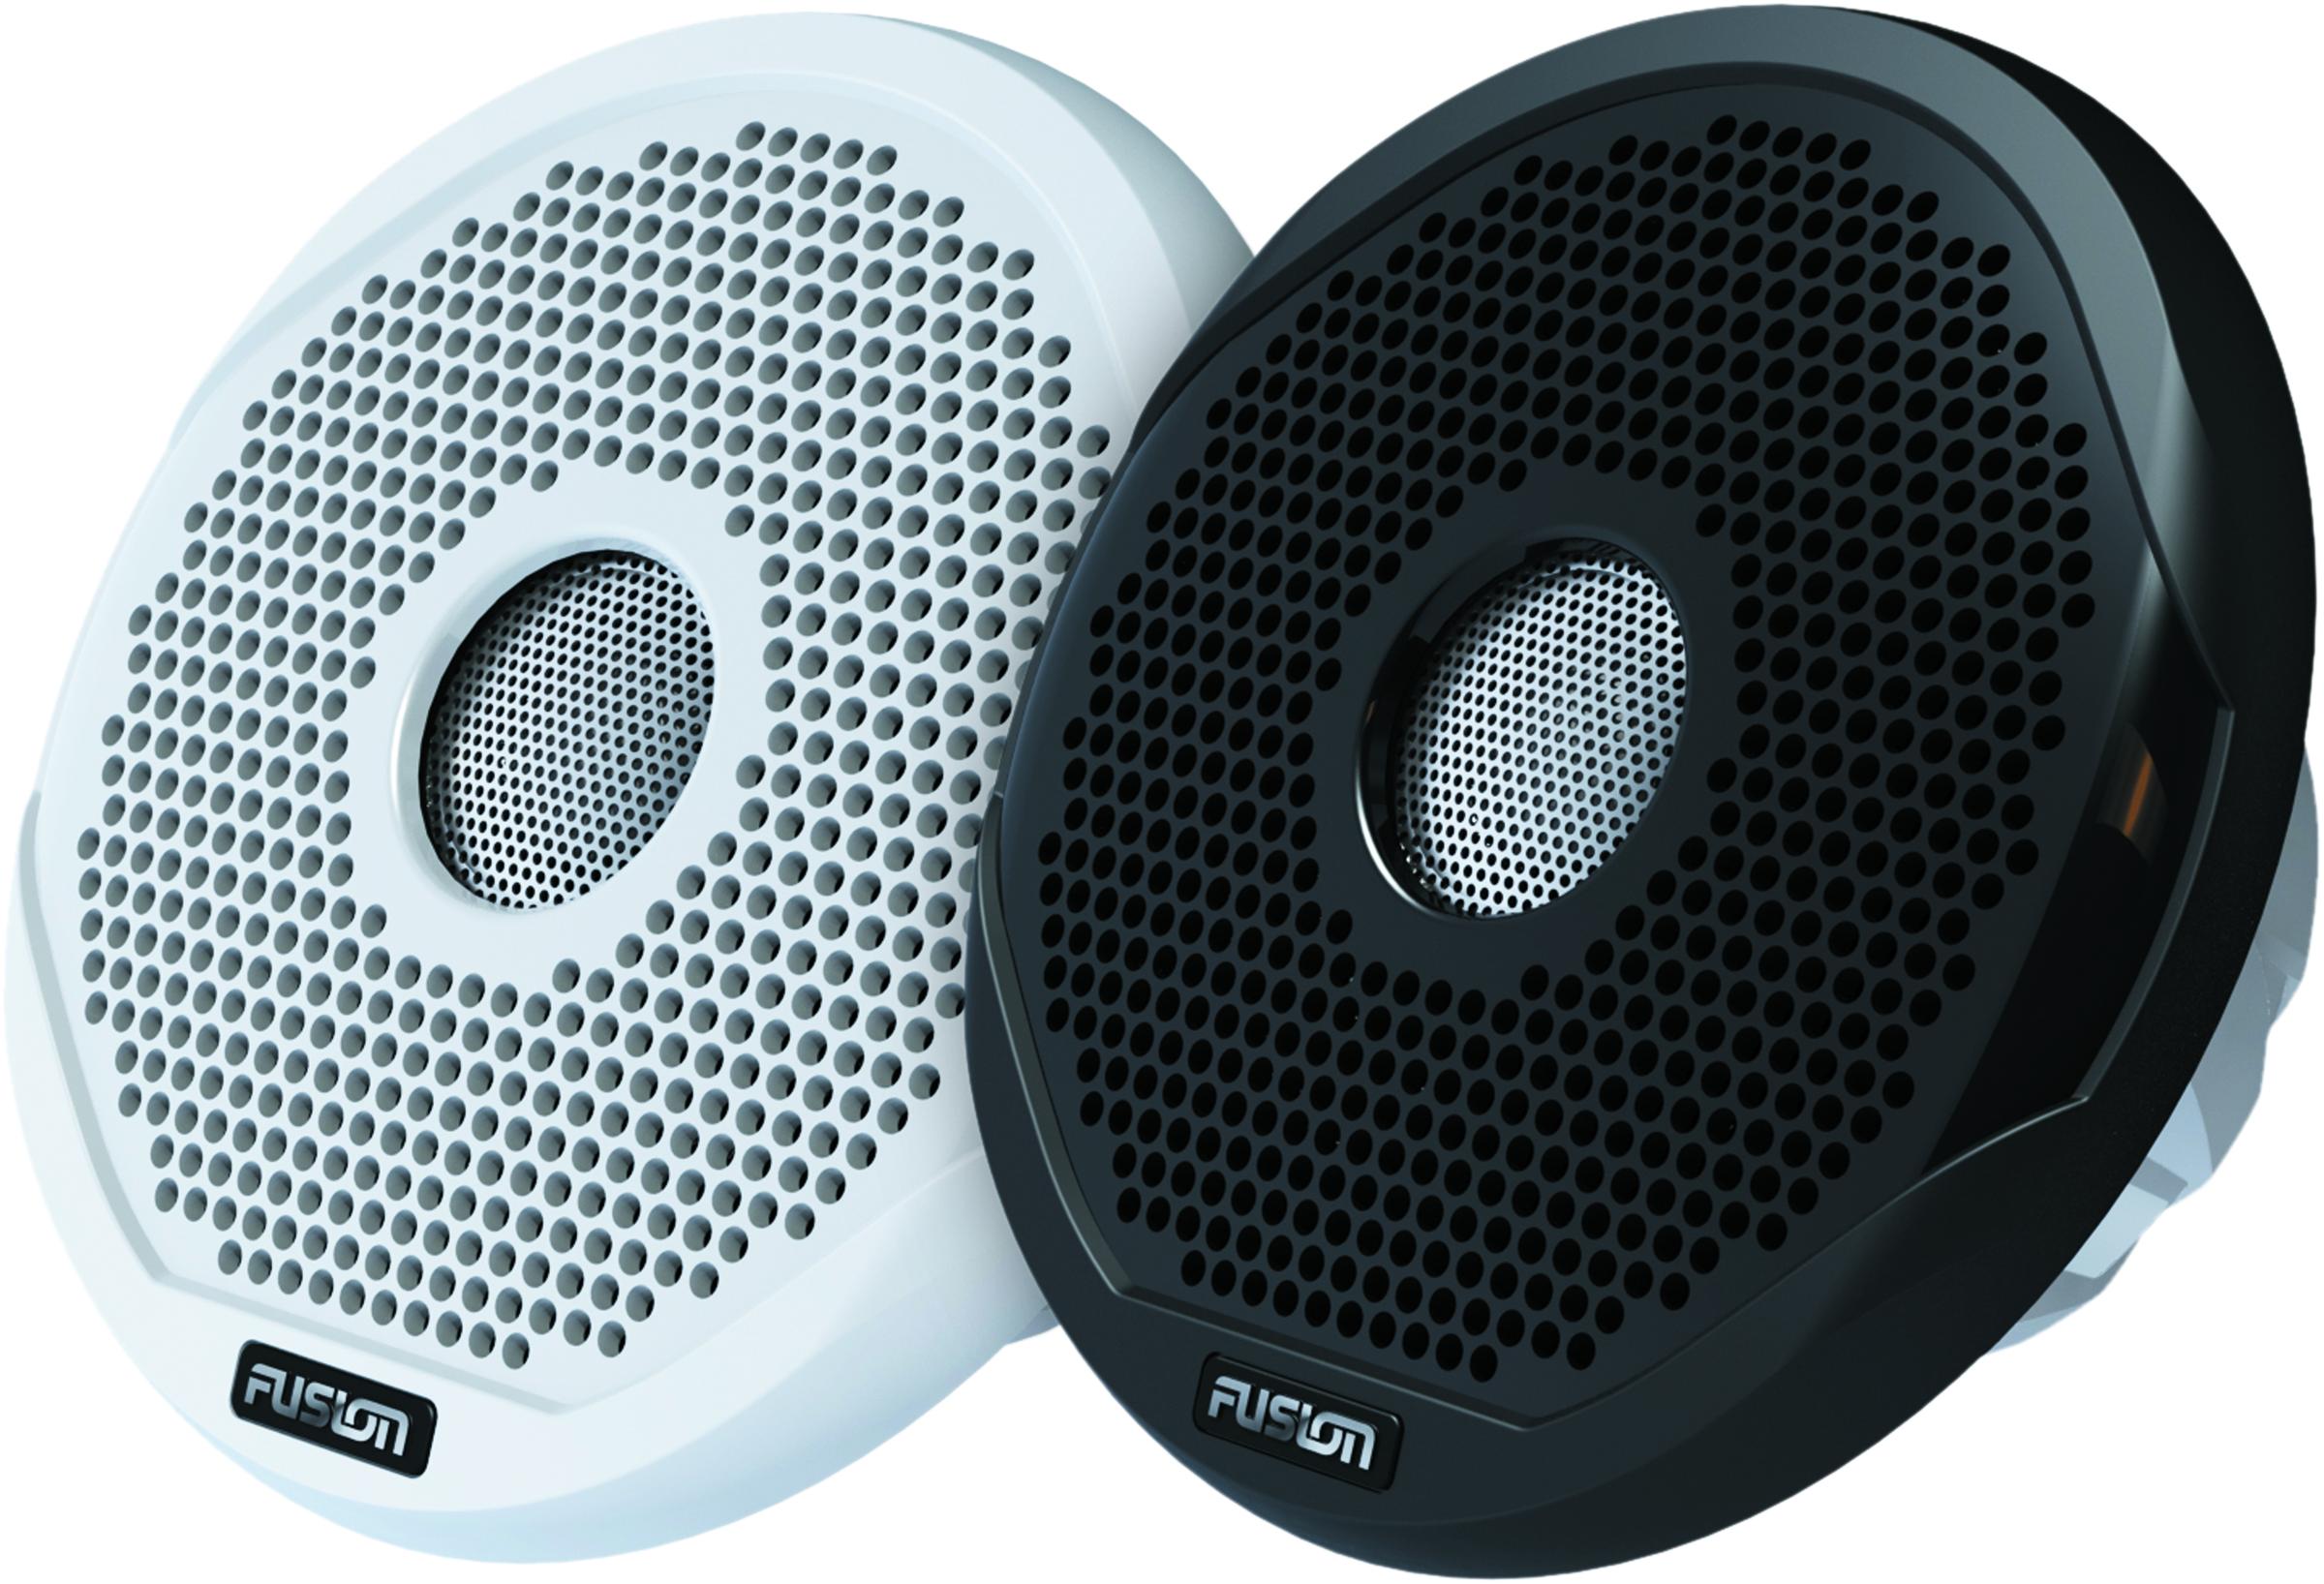 fusion ms fr6021 speaker group